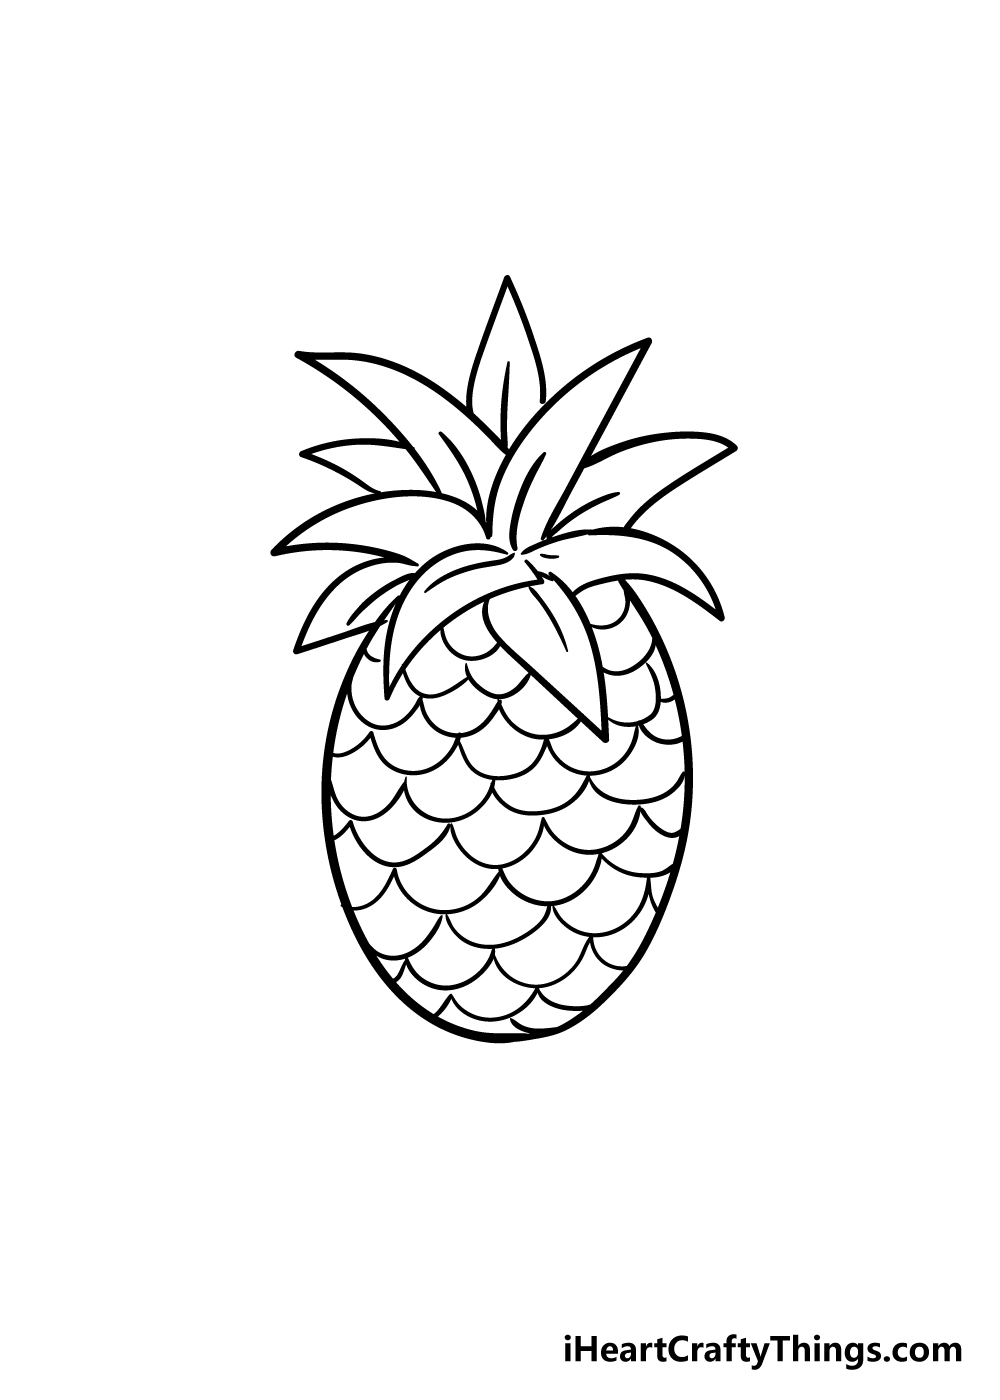 pineapple drawing step 7